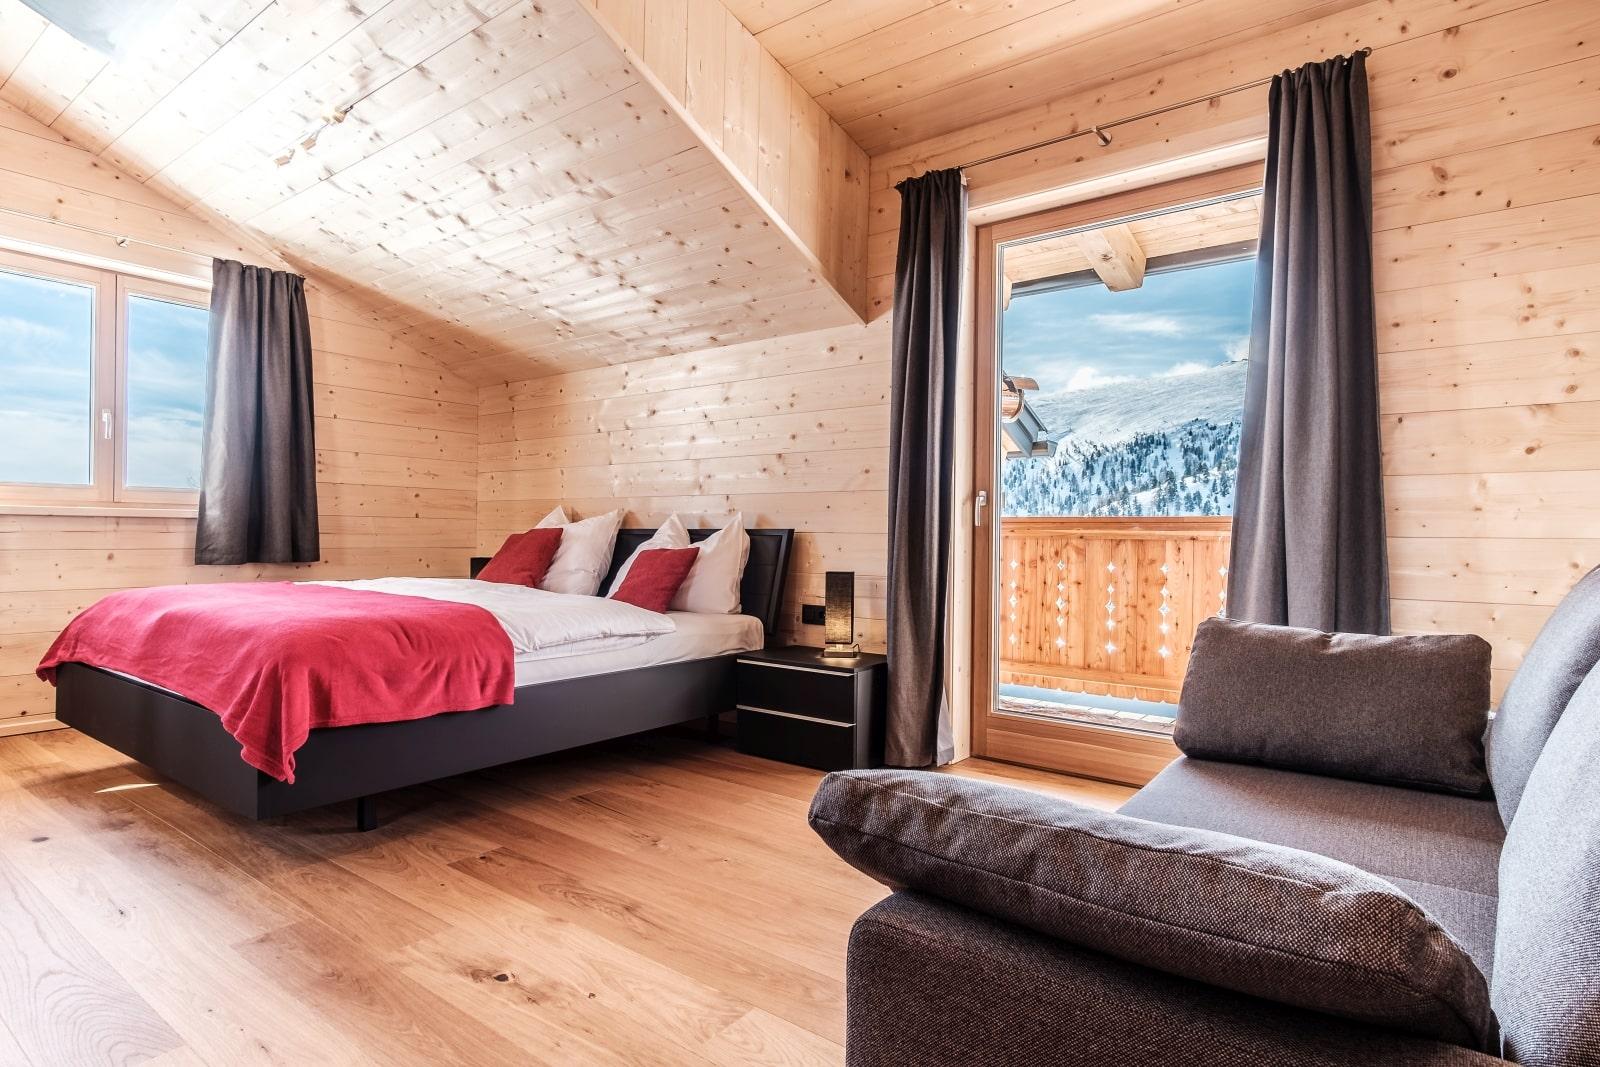 Heidi-Chalet-Falkert-Heidialm-Bergwinter-Schlafen-Doppelbett-Luxus-Balkon